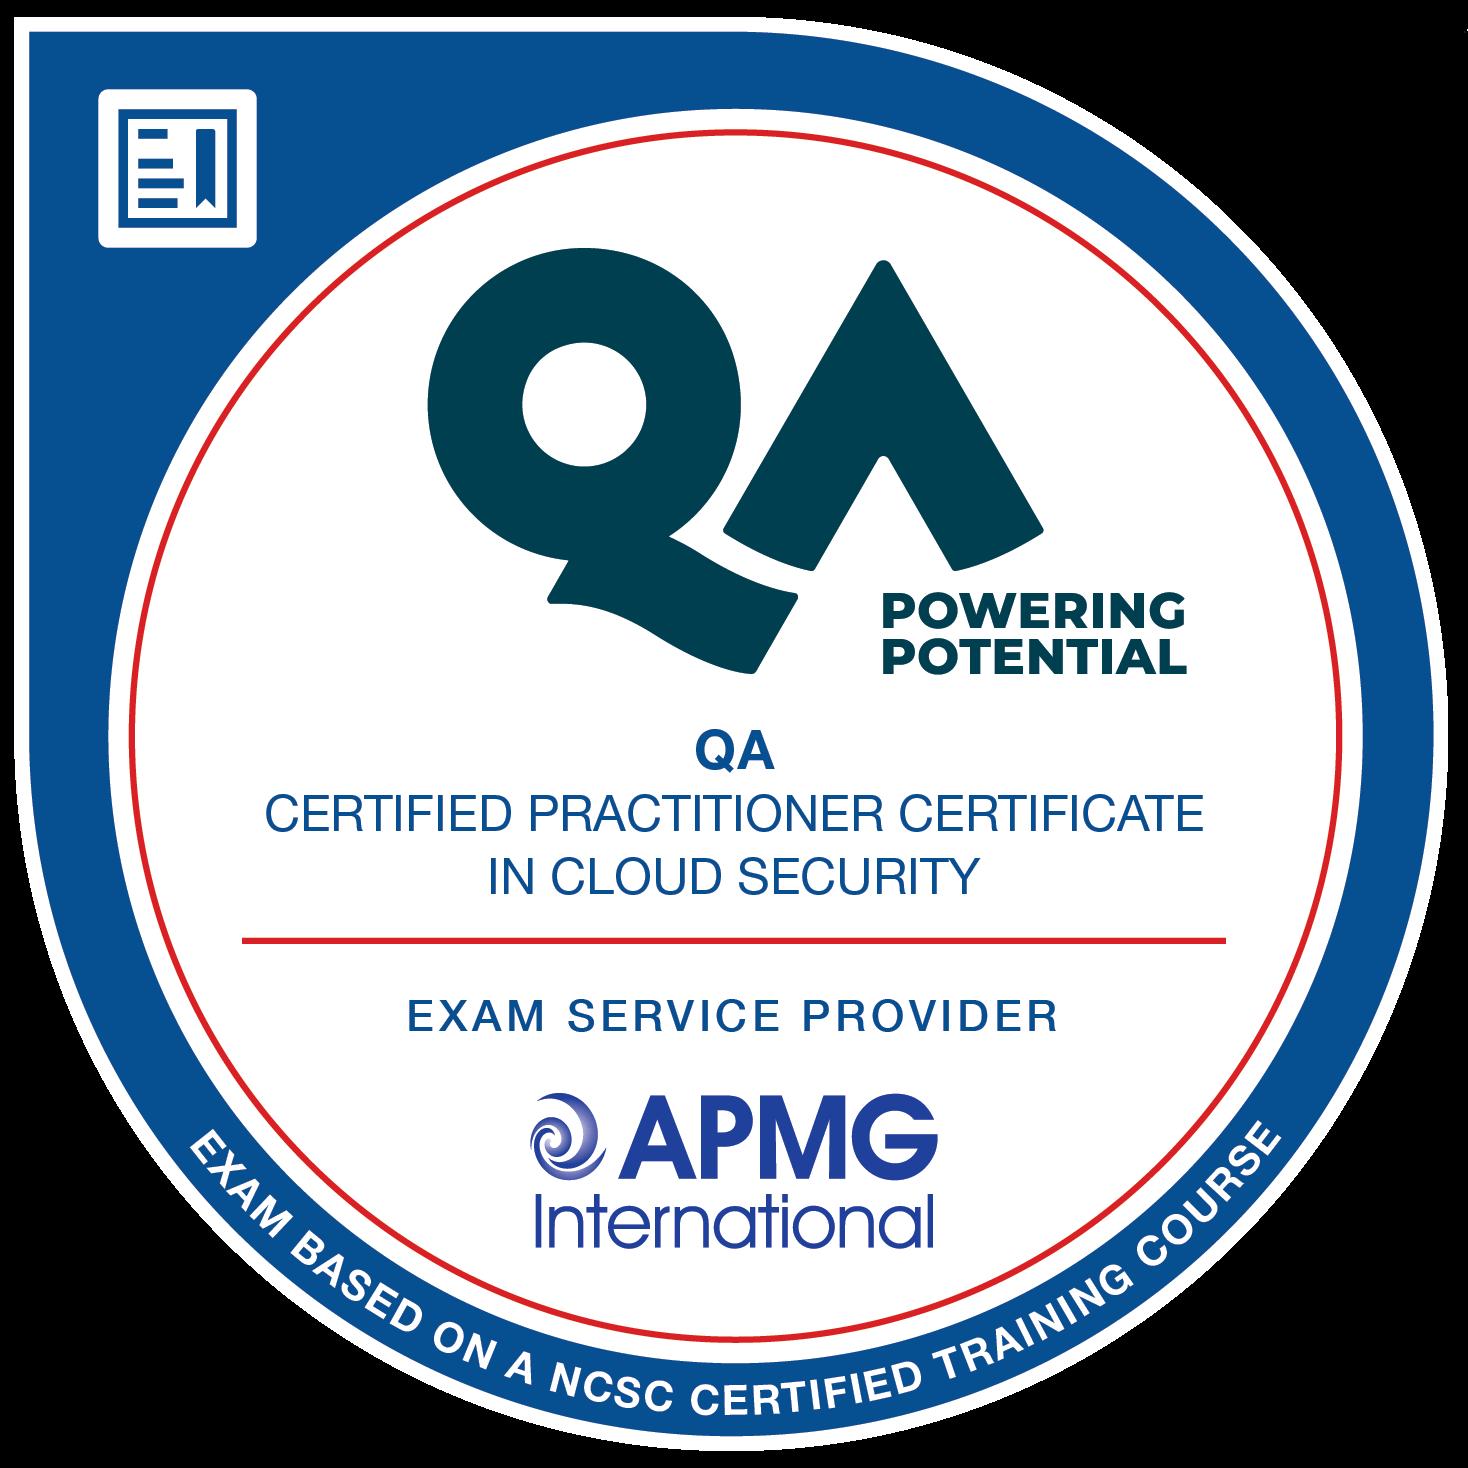 Practitioner Certificate in Cloud Security